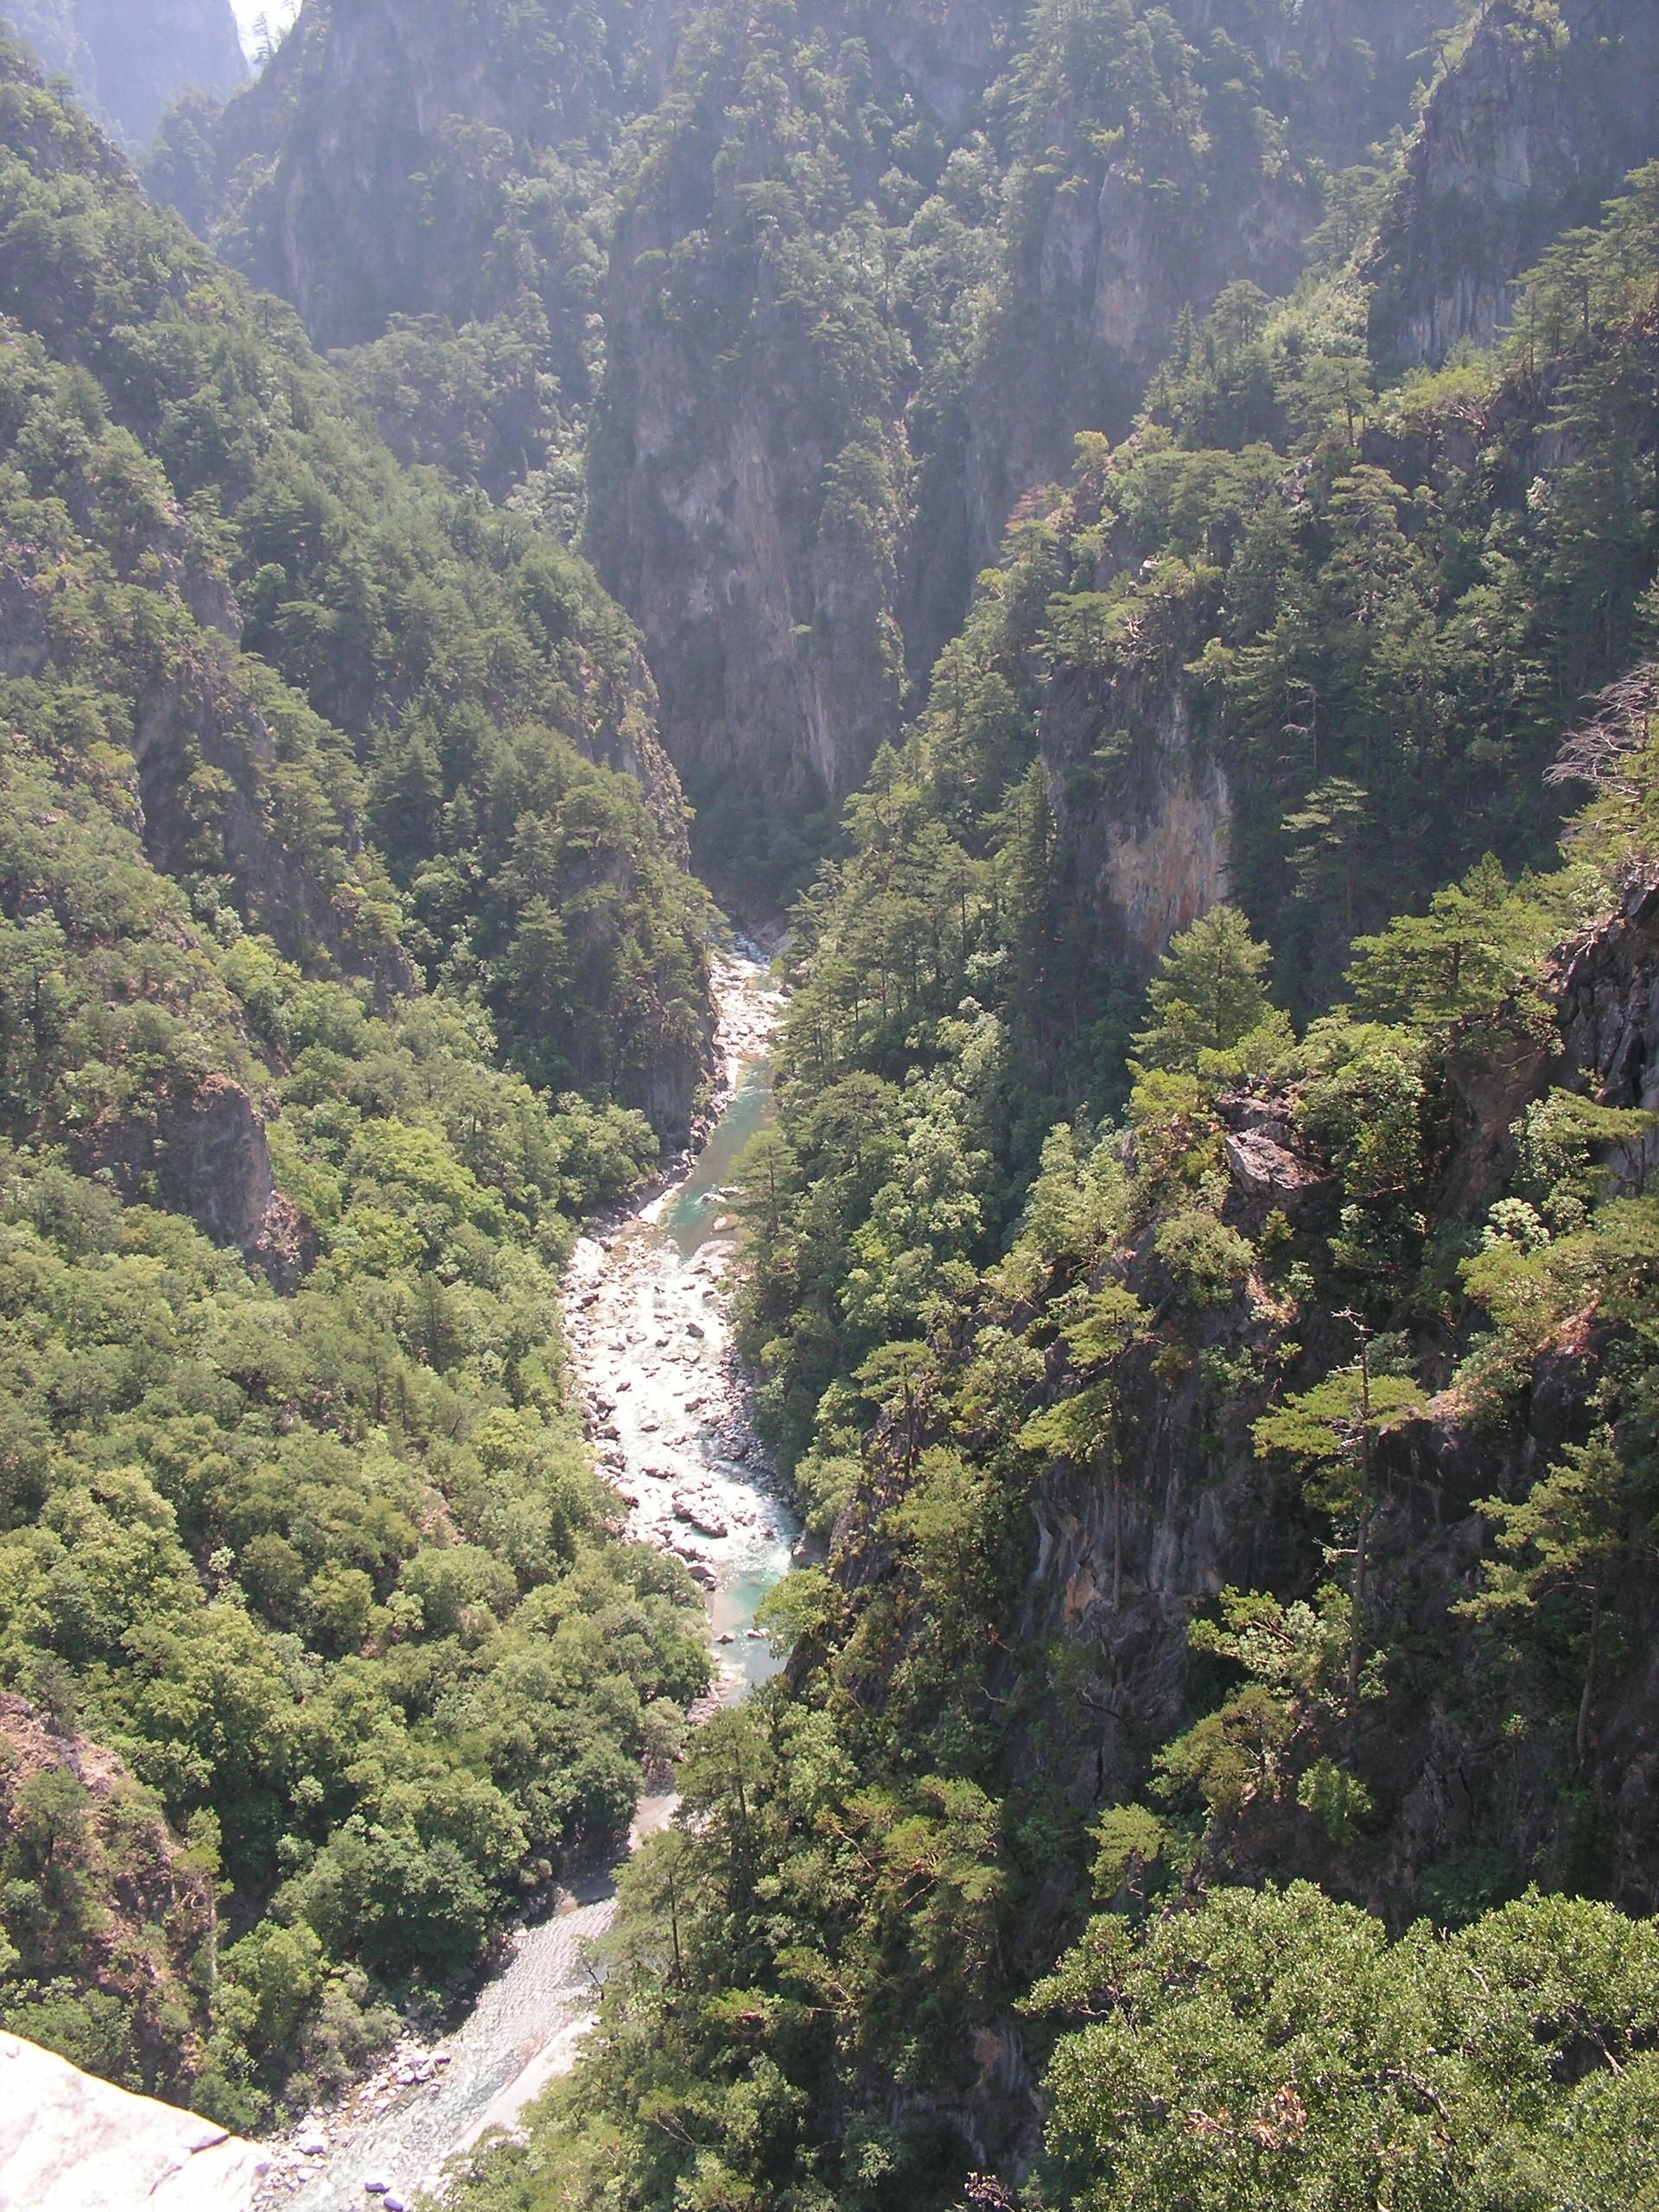 File:Vikos Gorge 1.JPG - Wikimedia Commons